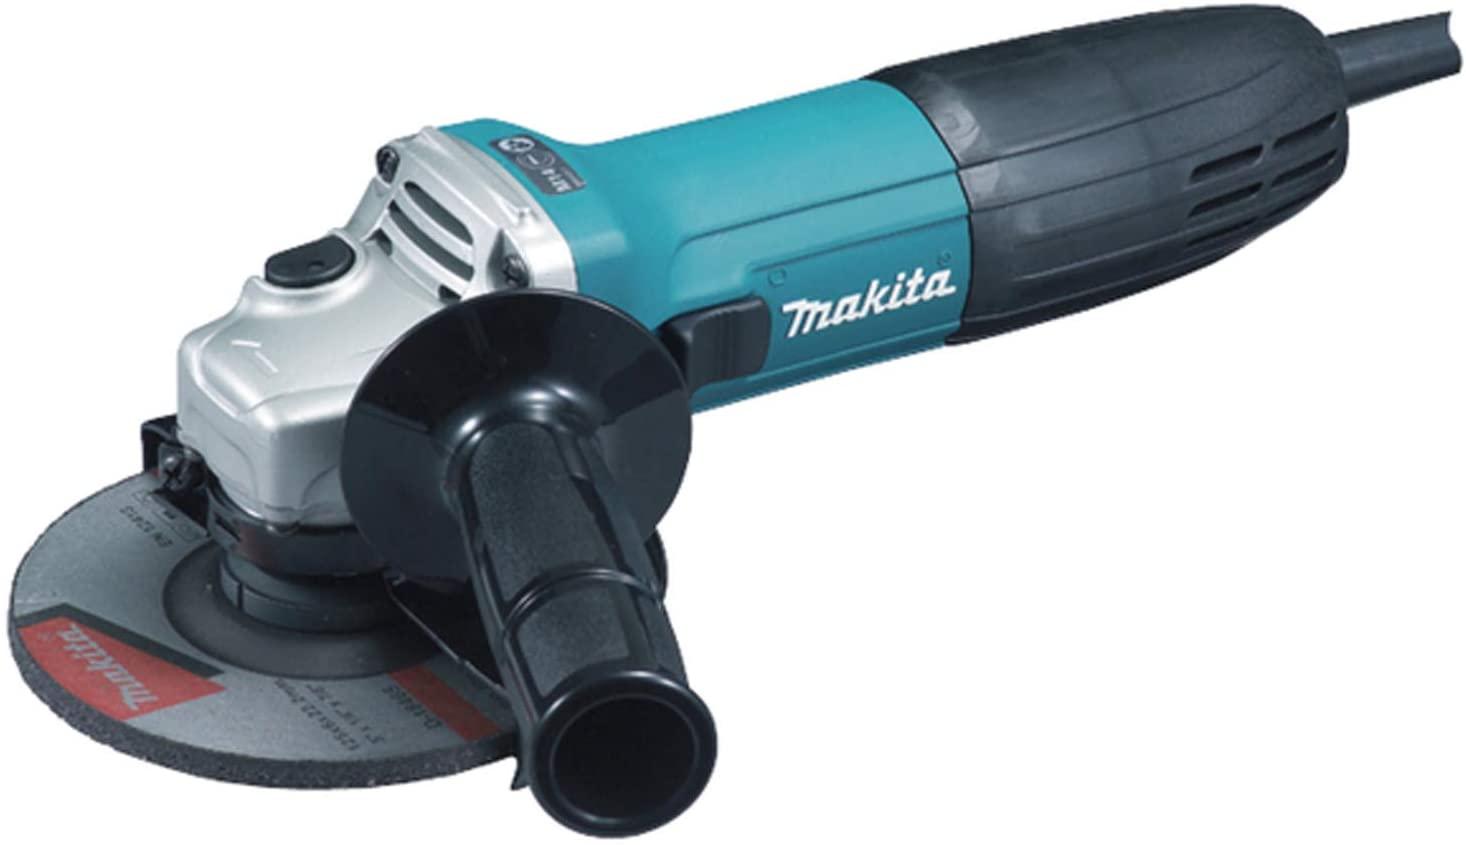 Meuleuse filaire Makita GA5030 - Ø 125 mm, 720 W